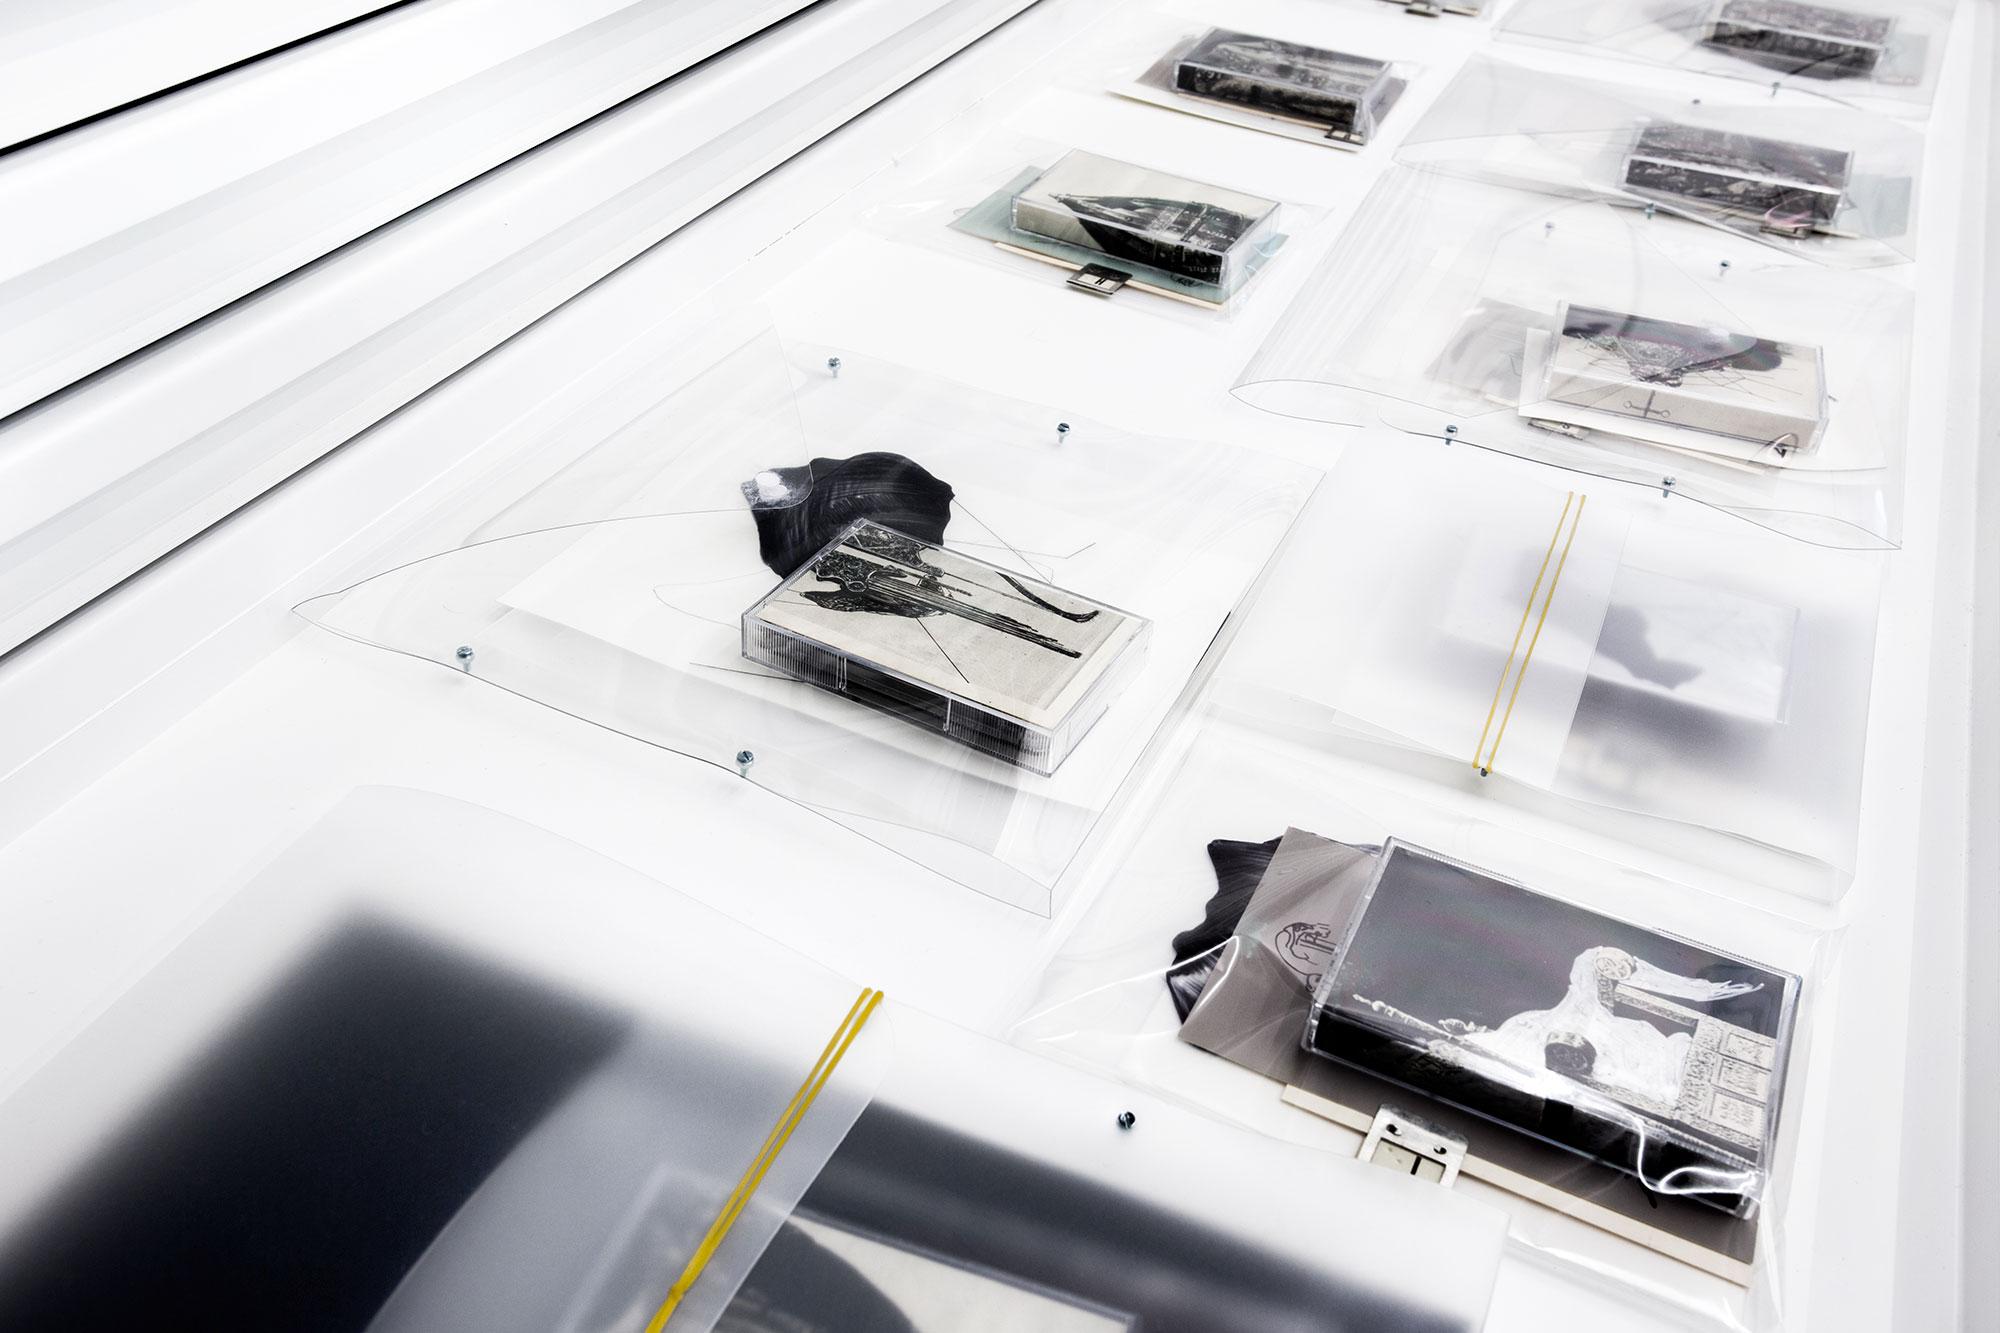 Jacek Doroszenko - Useful Remnants, album detail 13, Kasia Michalski Gallery